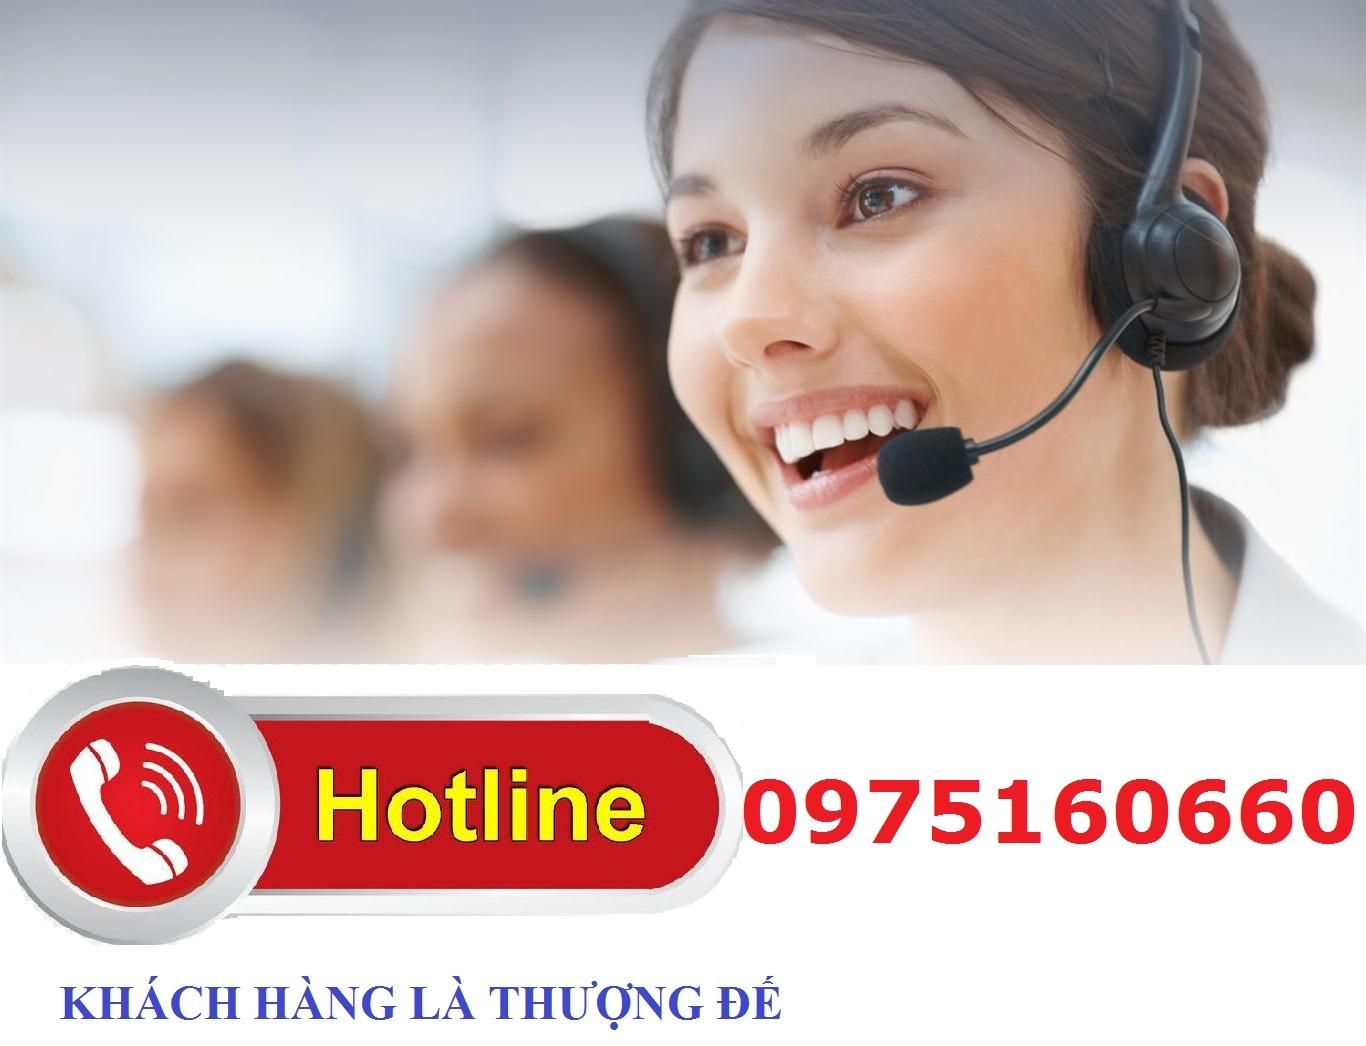 HOTLINE: 0975160660